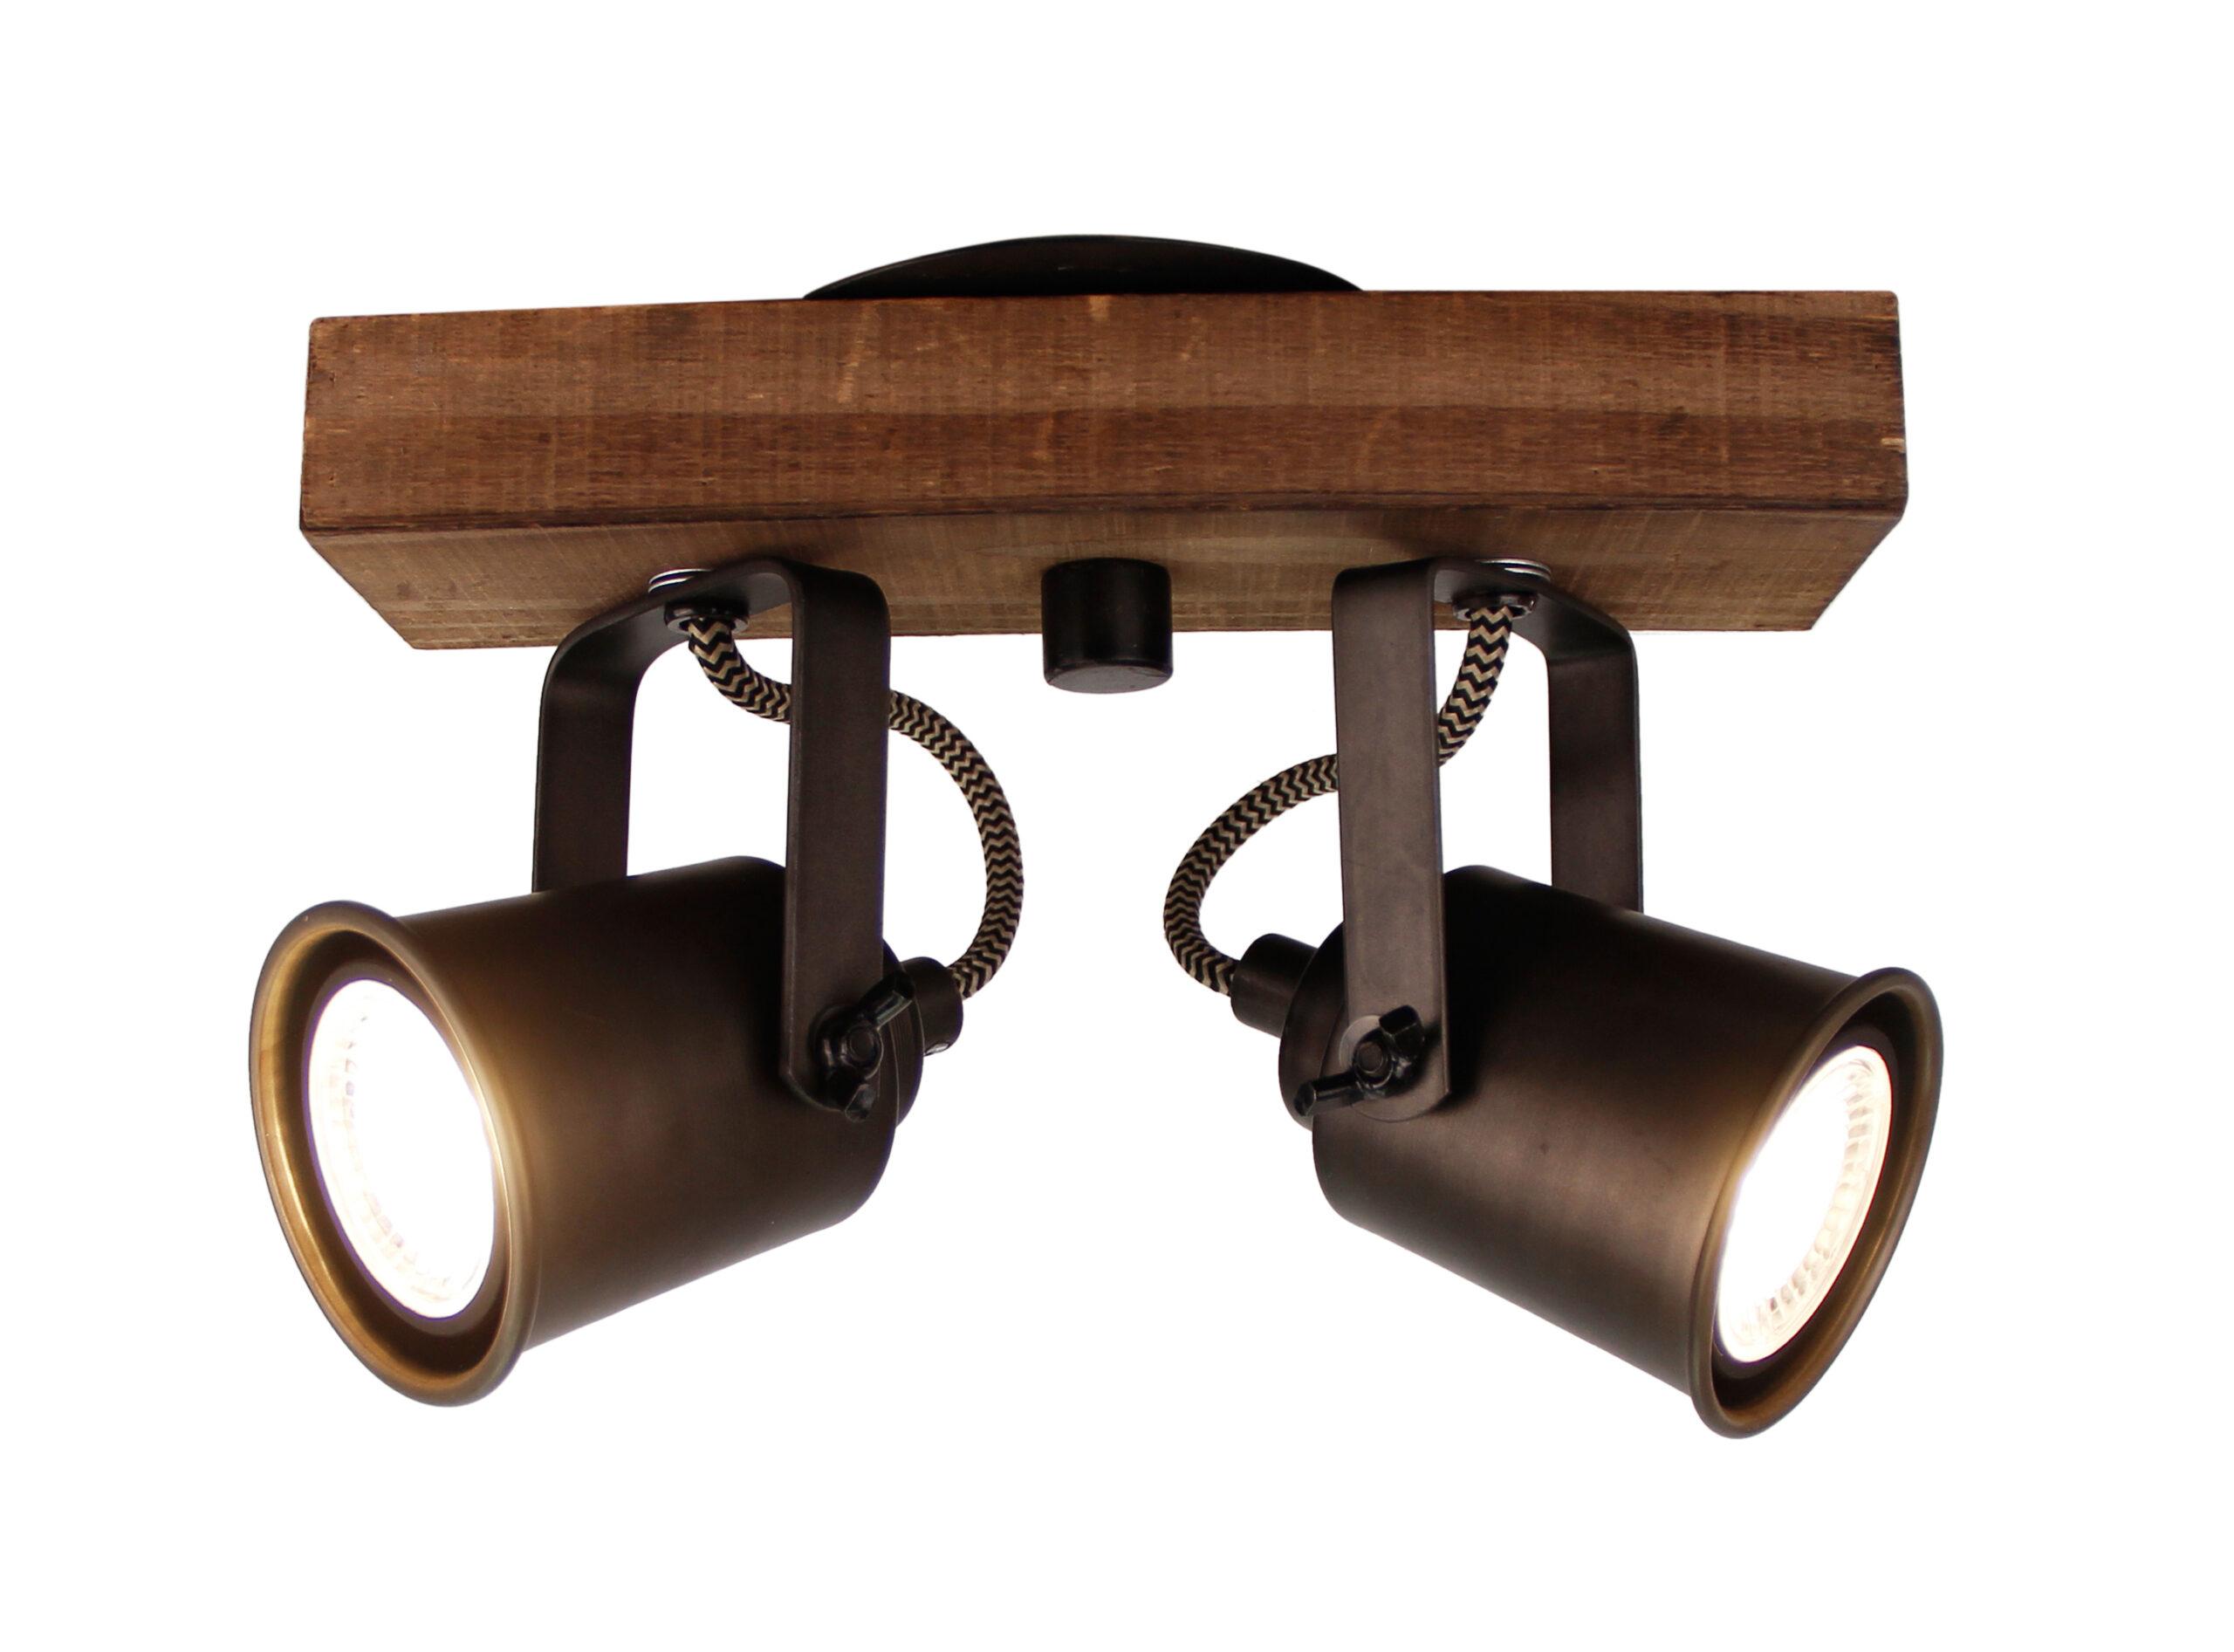 Tazza spot - 2 lichts - zwart black steel met vintage hout